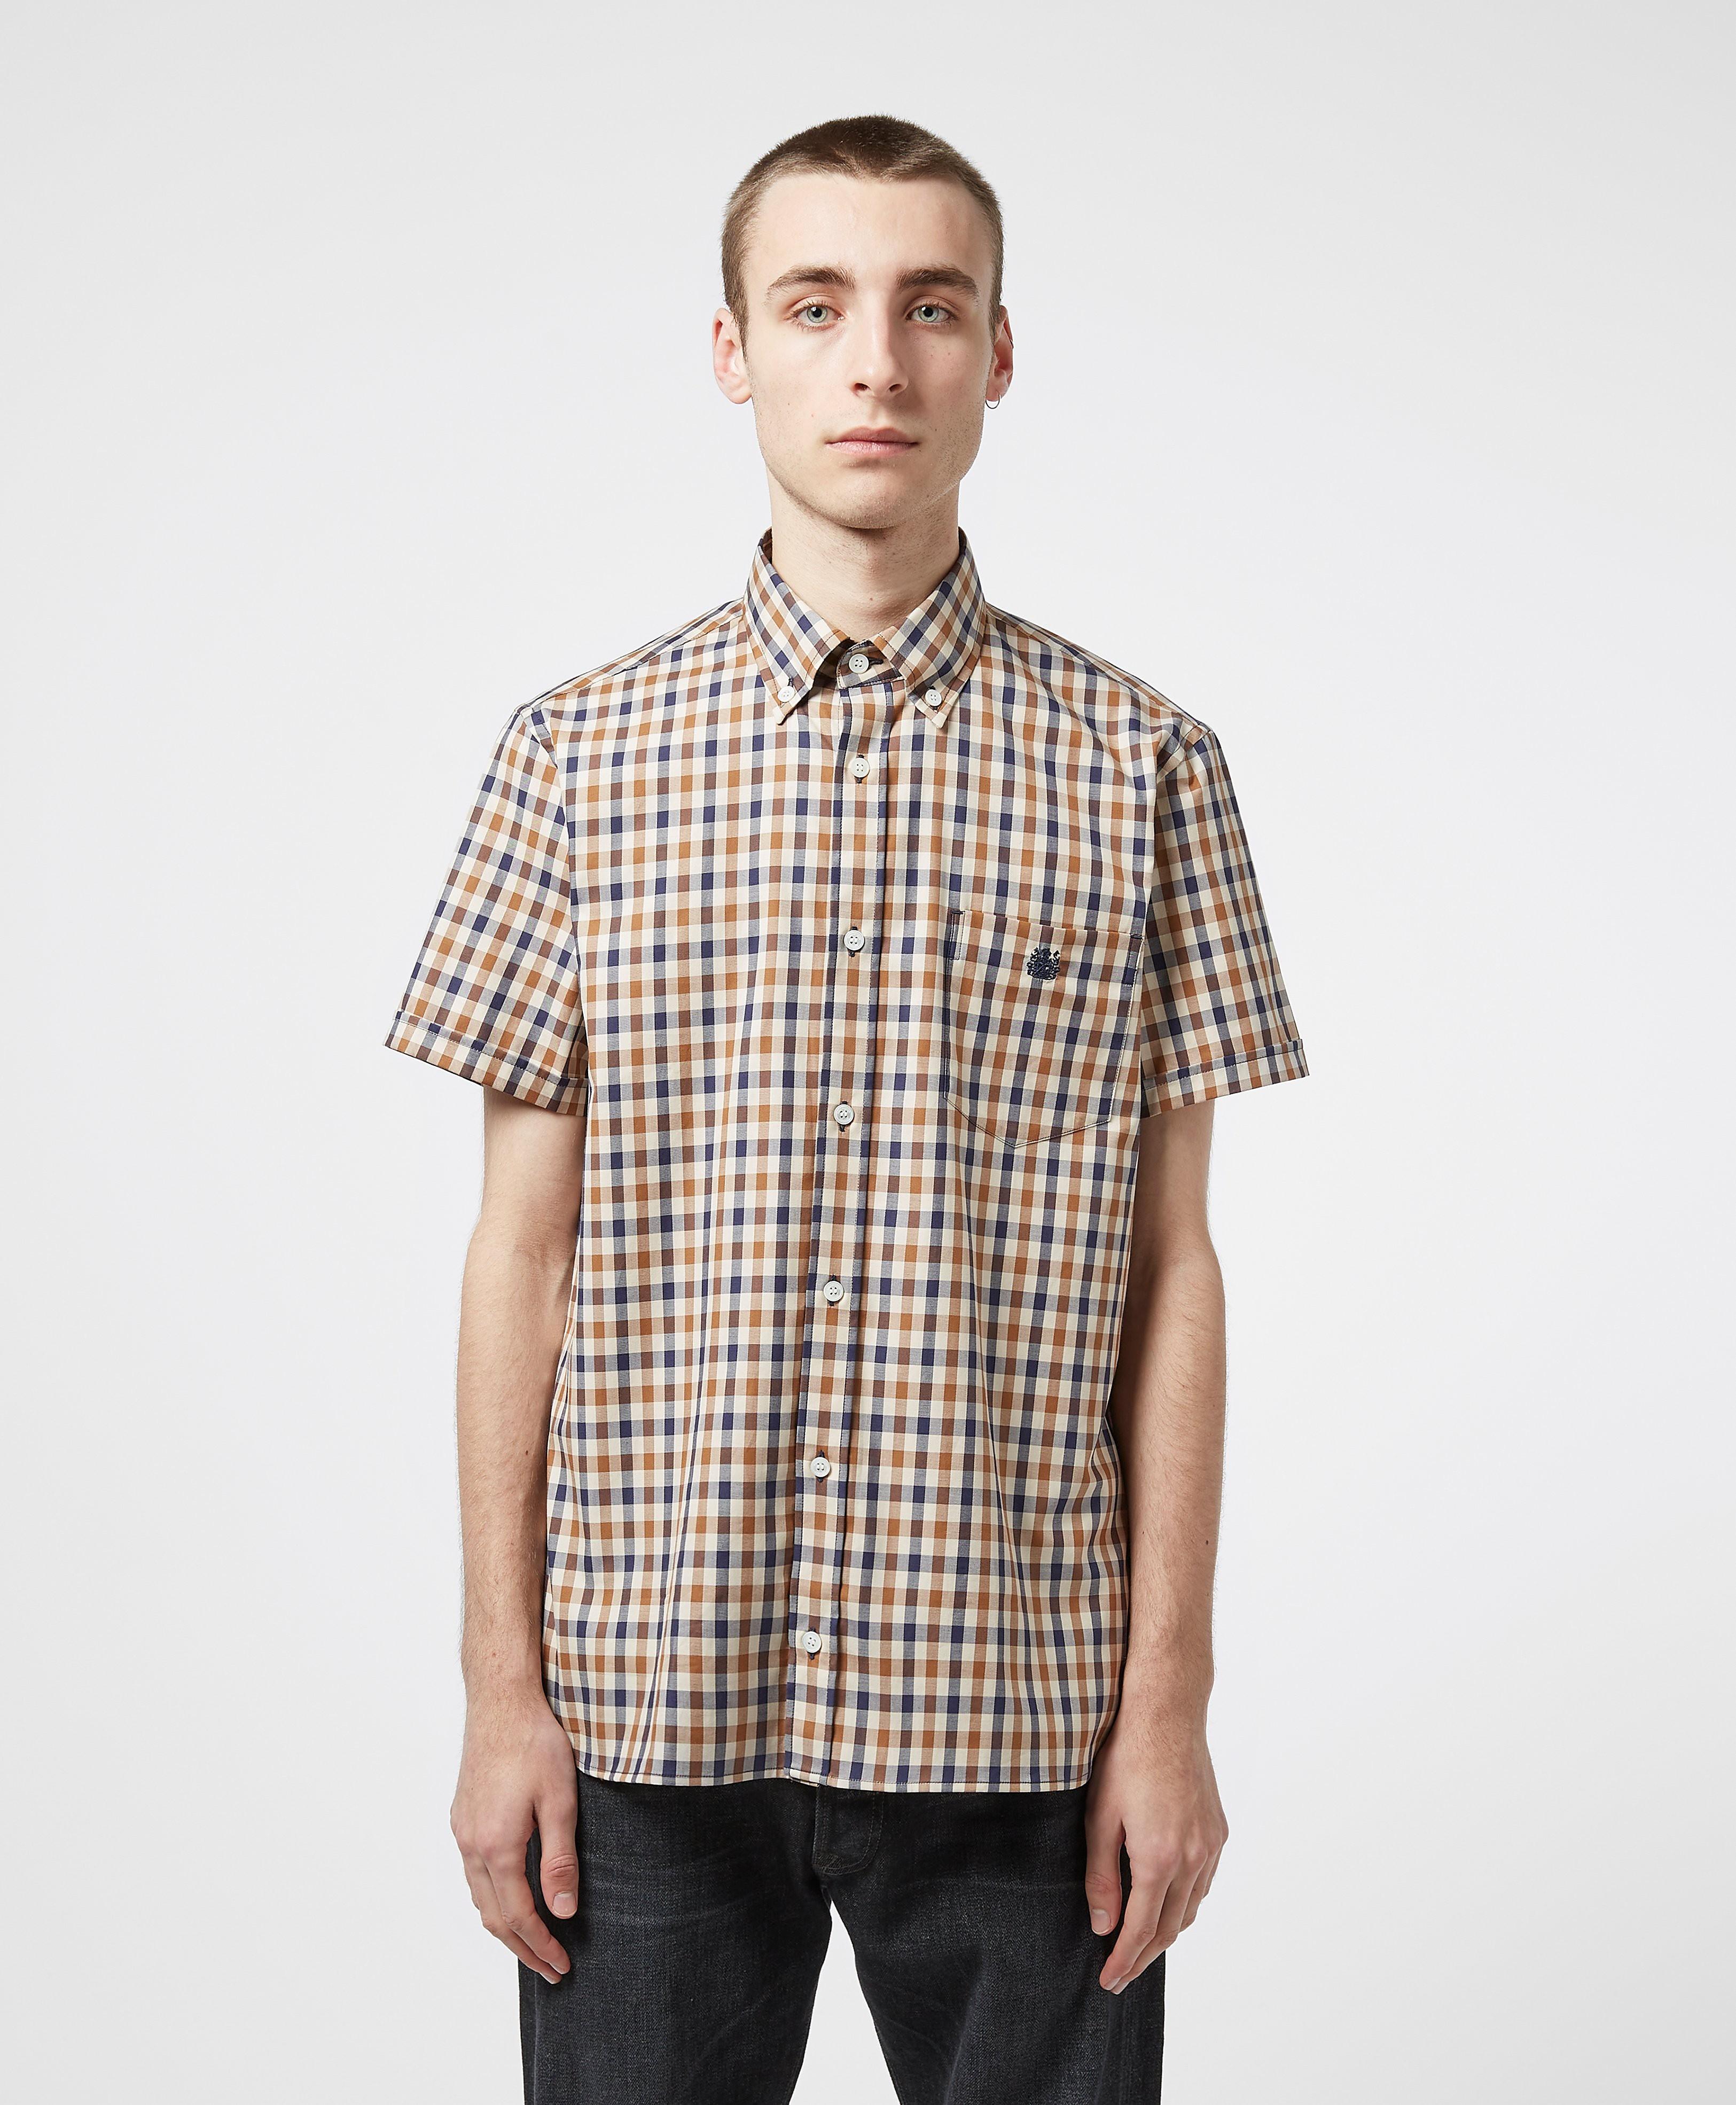 Aquascutum Club Check Short Sleeve Shirt